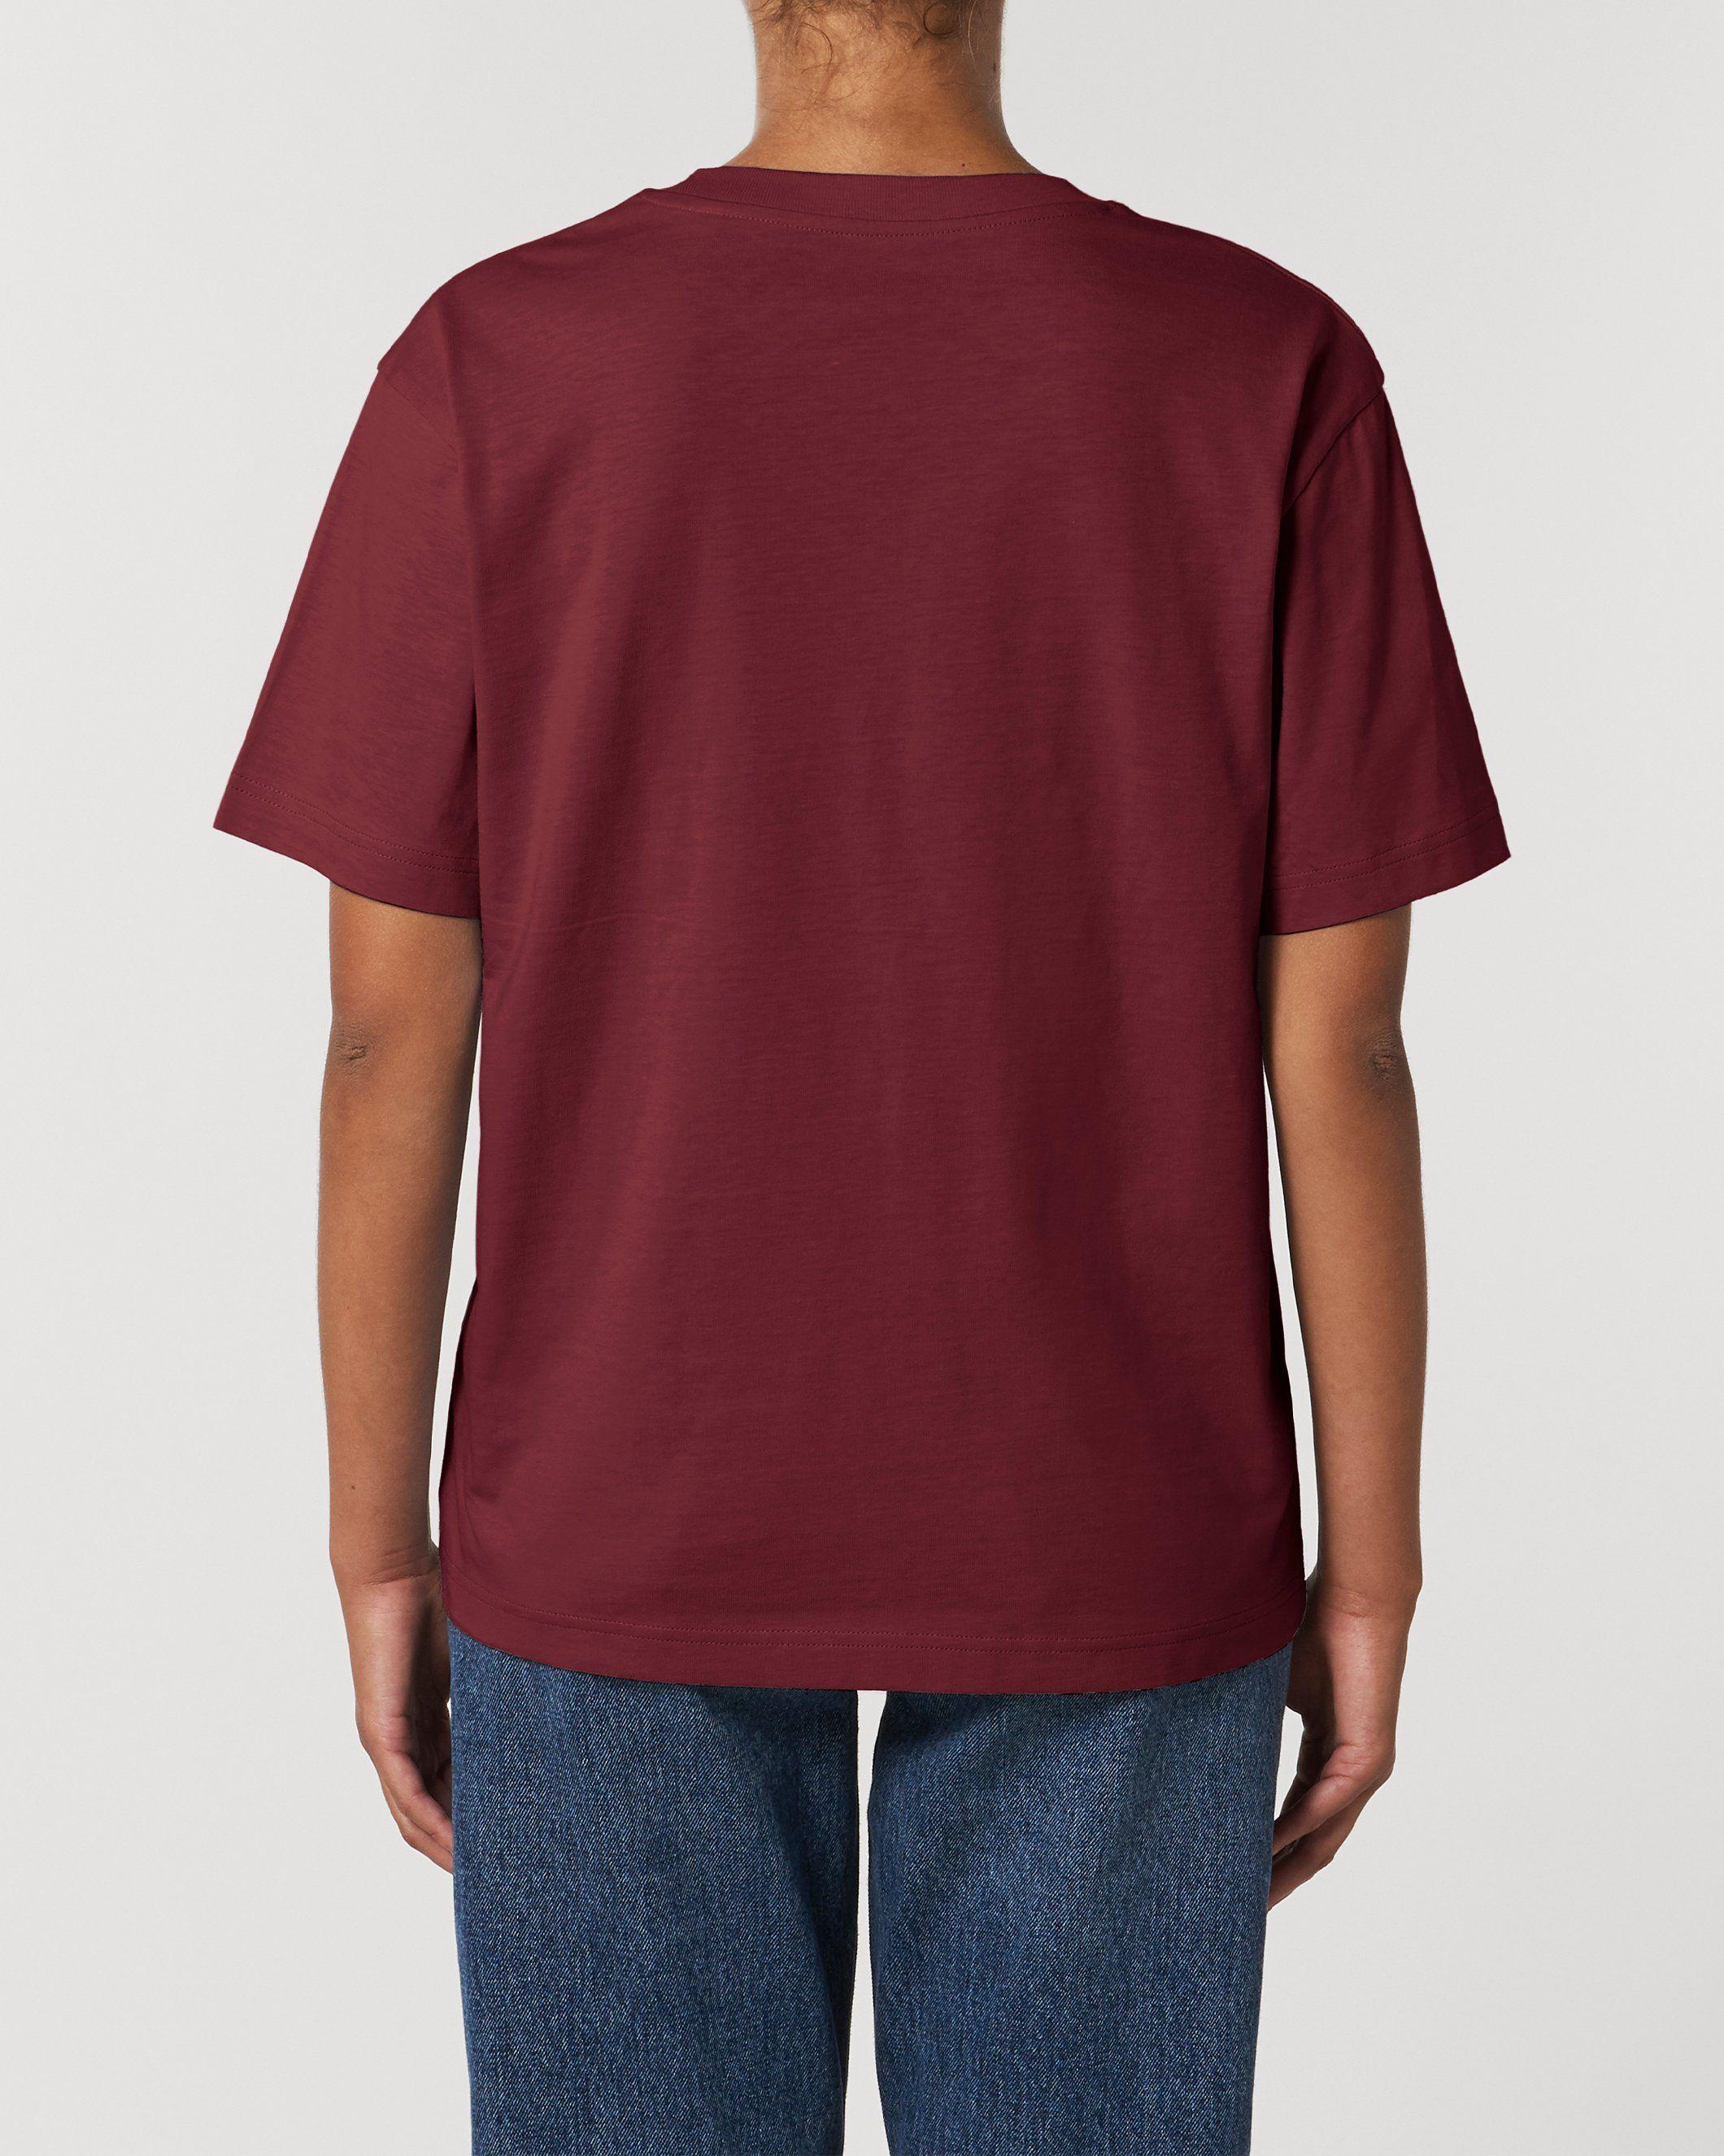 Antaratma Unisex Relaxed T-Shirt in Burgundy